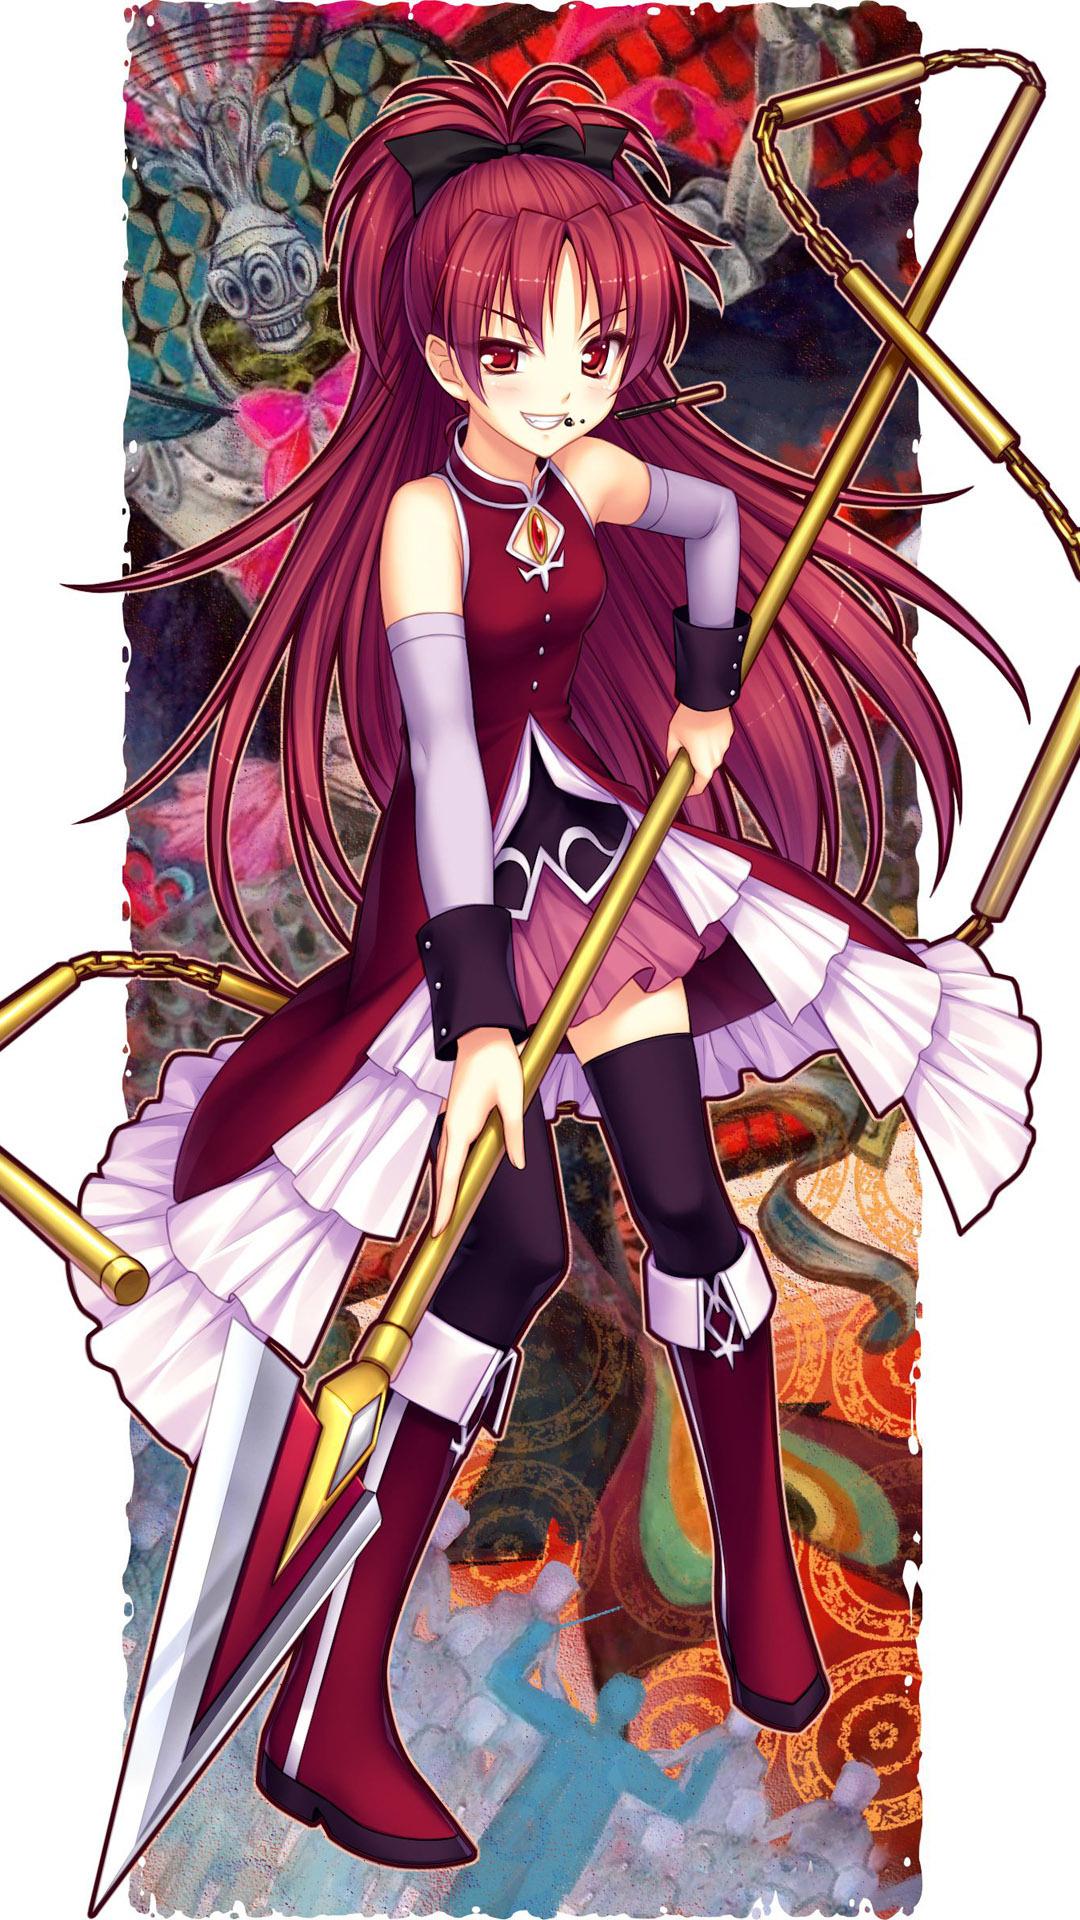 Kyoko Sakura Puella Magi Madoka Magica Anime Mobile - Puella Magi Madoka Magica Kyoko Anime - HD Wallpaper